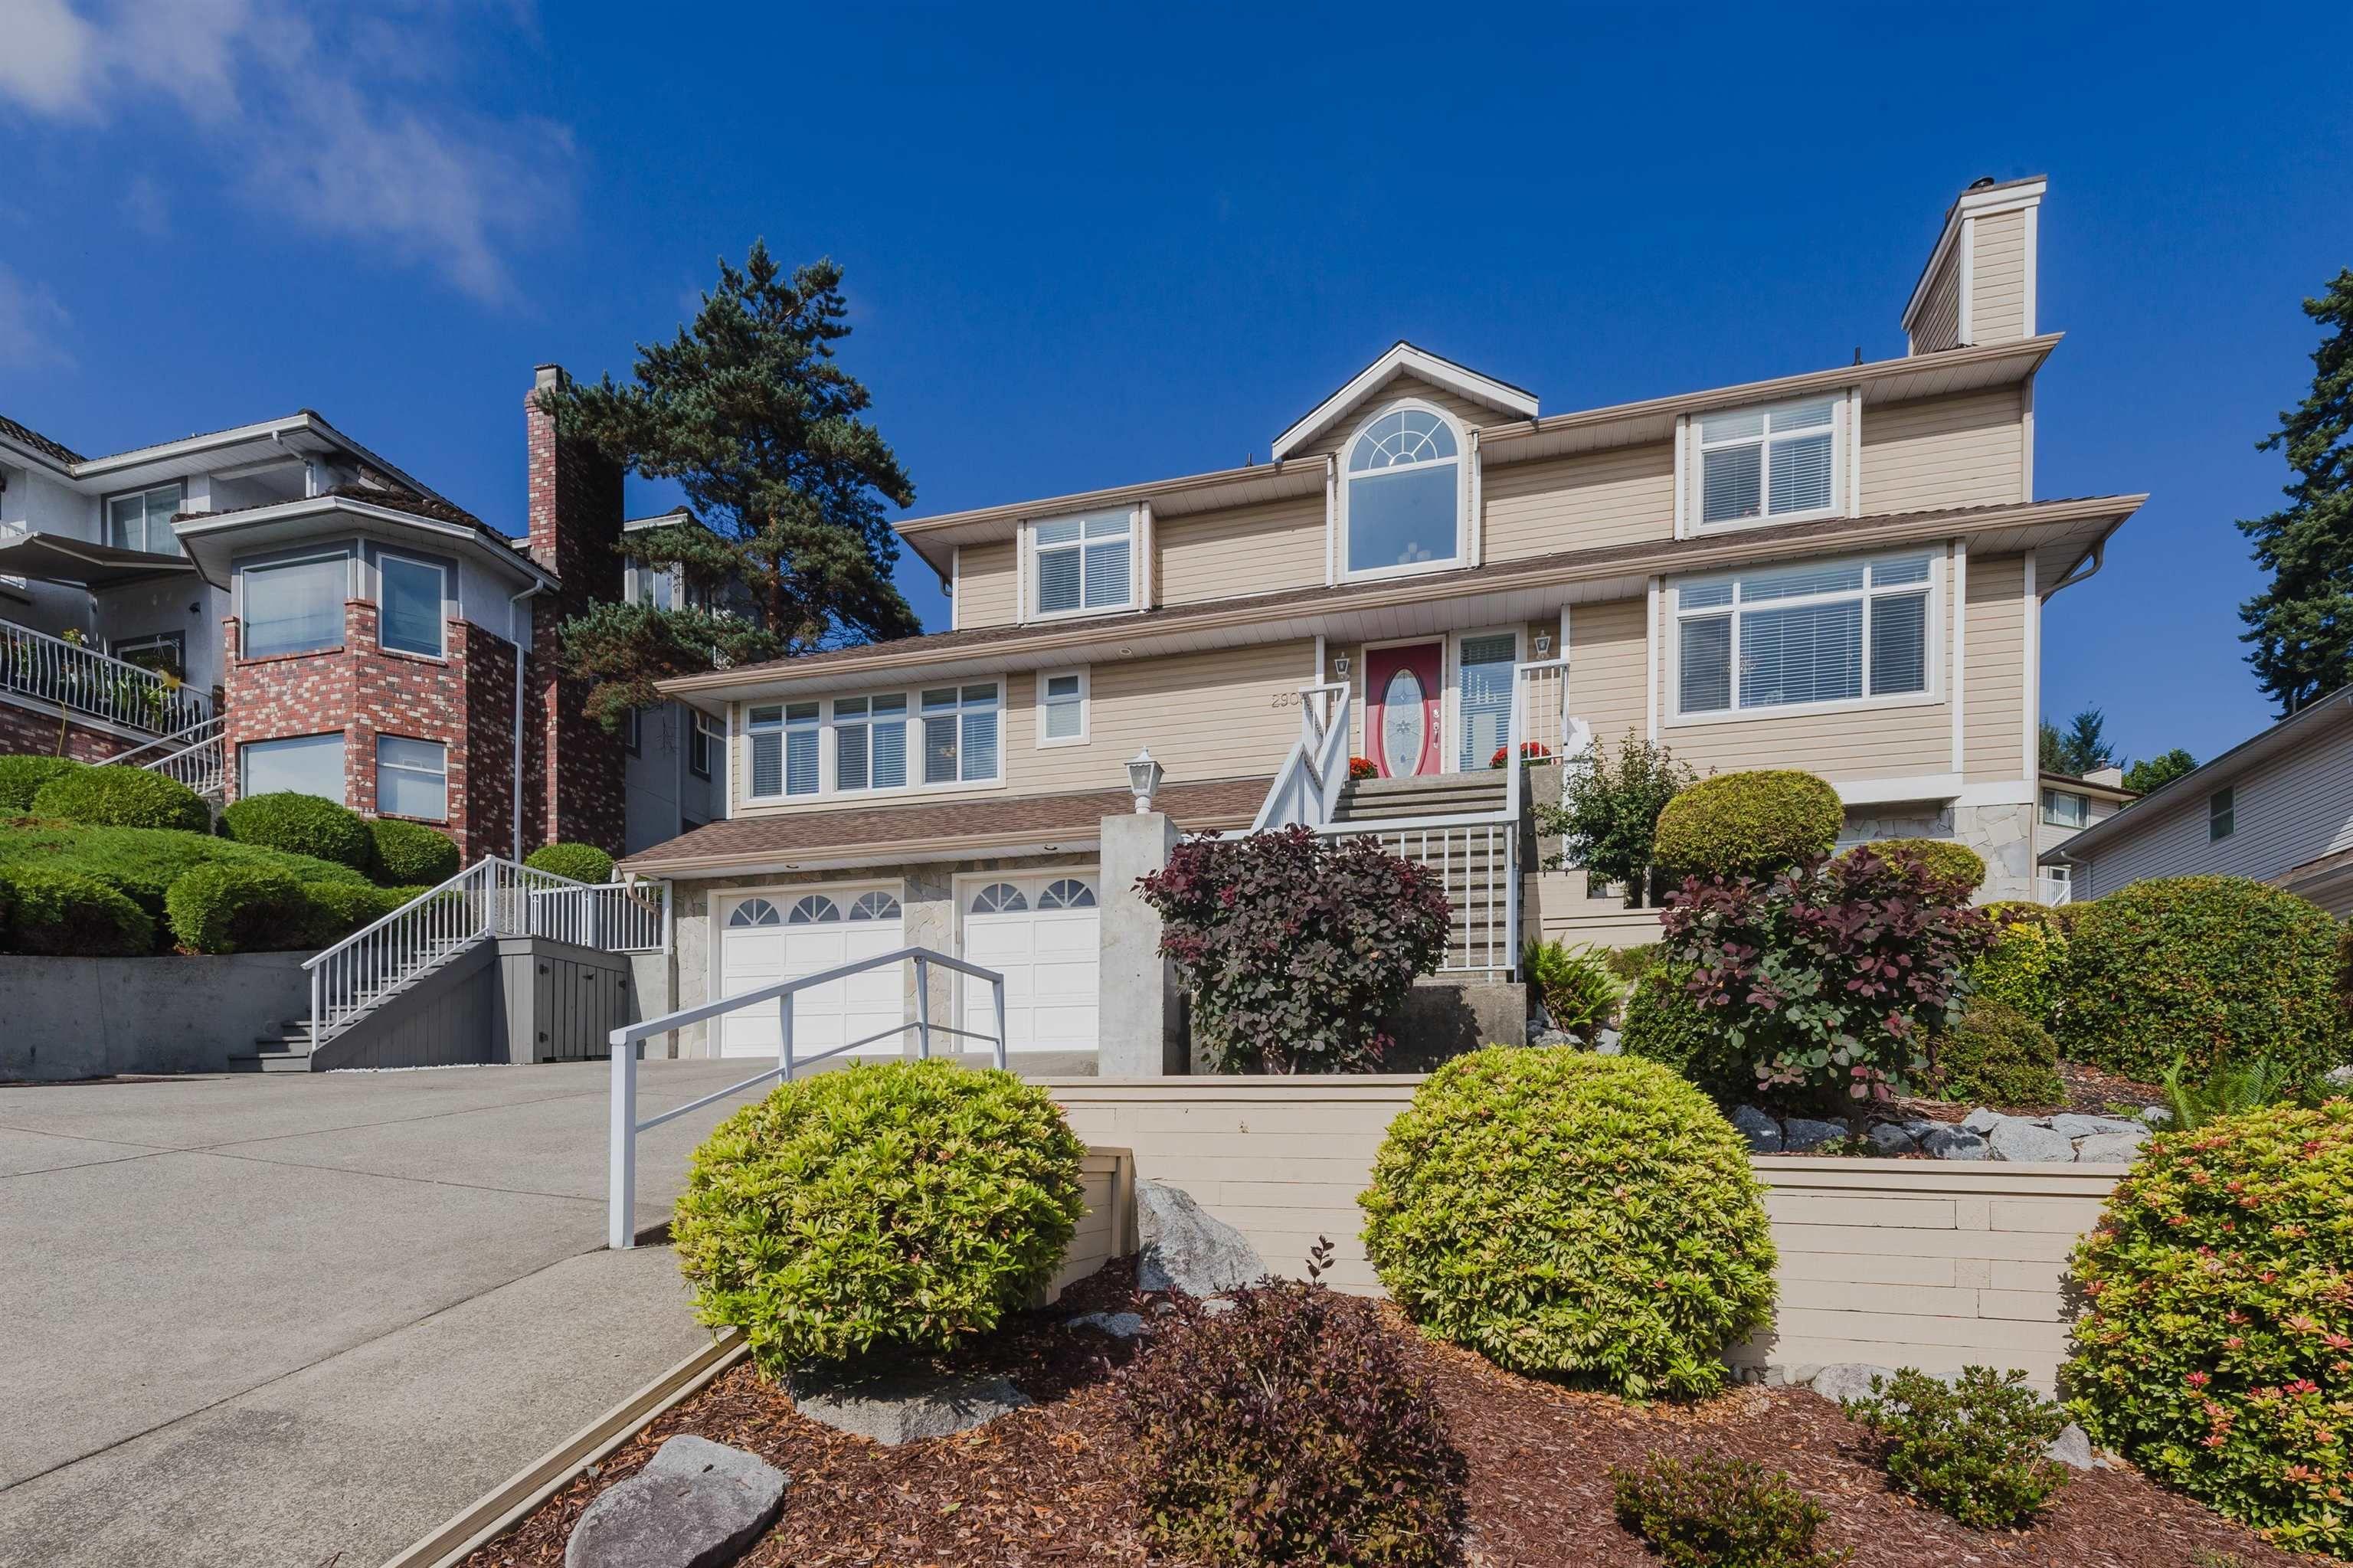 Main Photo: 2908 KALAMALKA Drive in Coquitlam: Coquitlam East House for sale : MLS®# R2622040